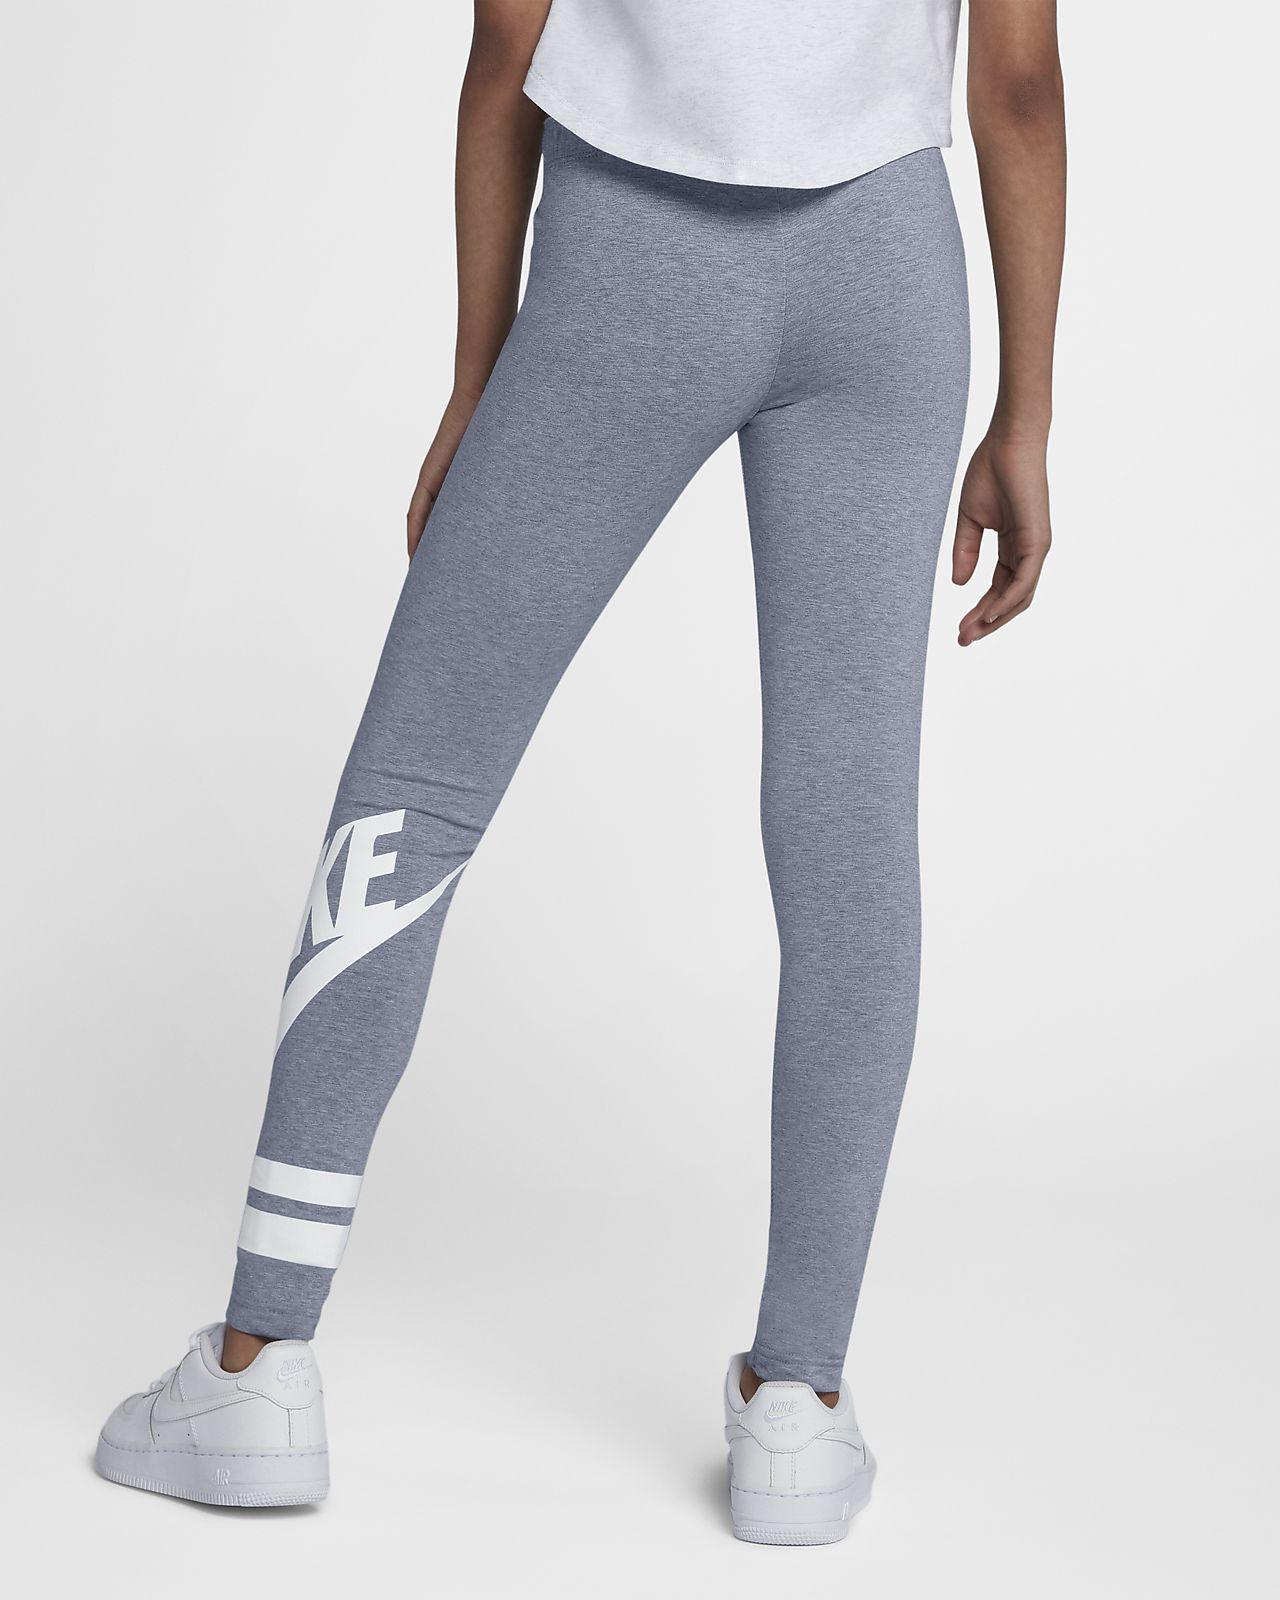 e1cbbe382ca942 ... Nike Sportswear Leggings mit Grafik für ältere Kinder (Mädchen)